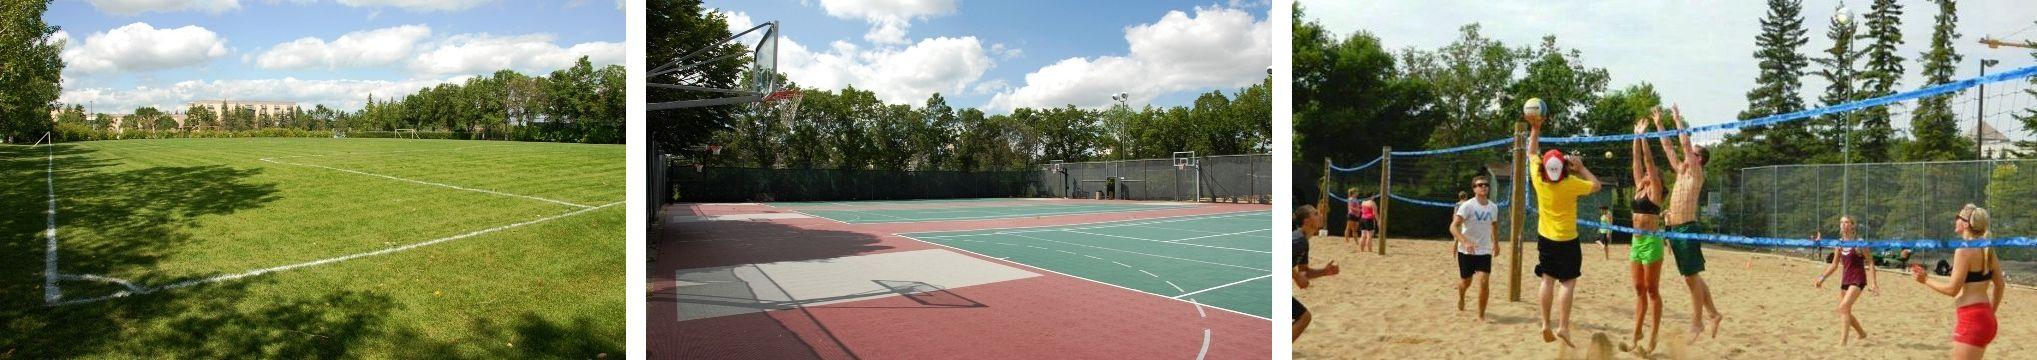 Beach Volleyball Facilities Services University Of Regina